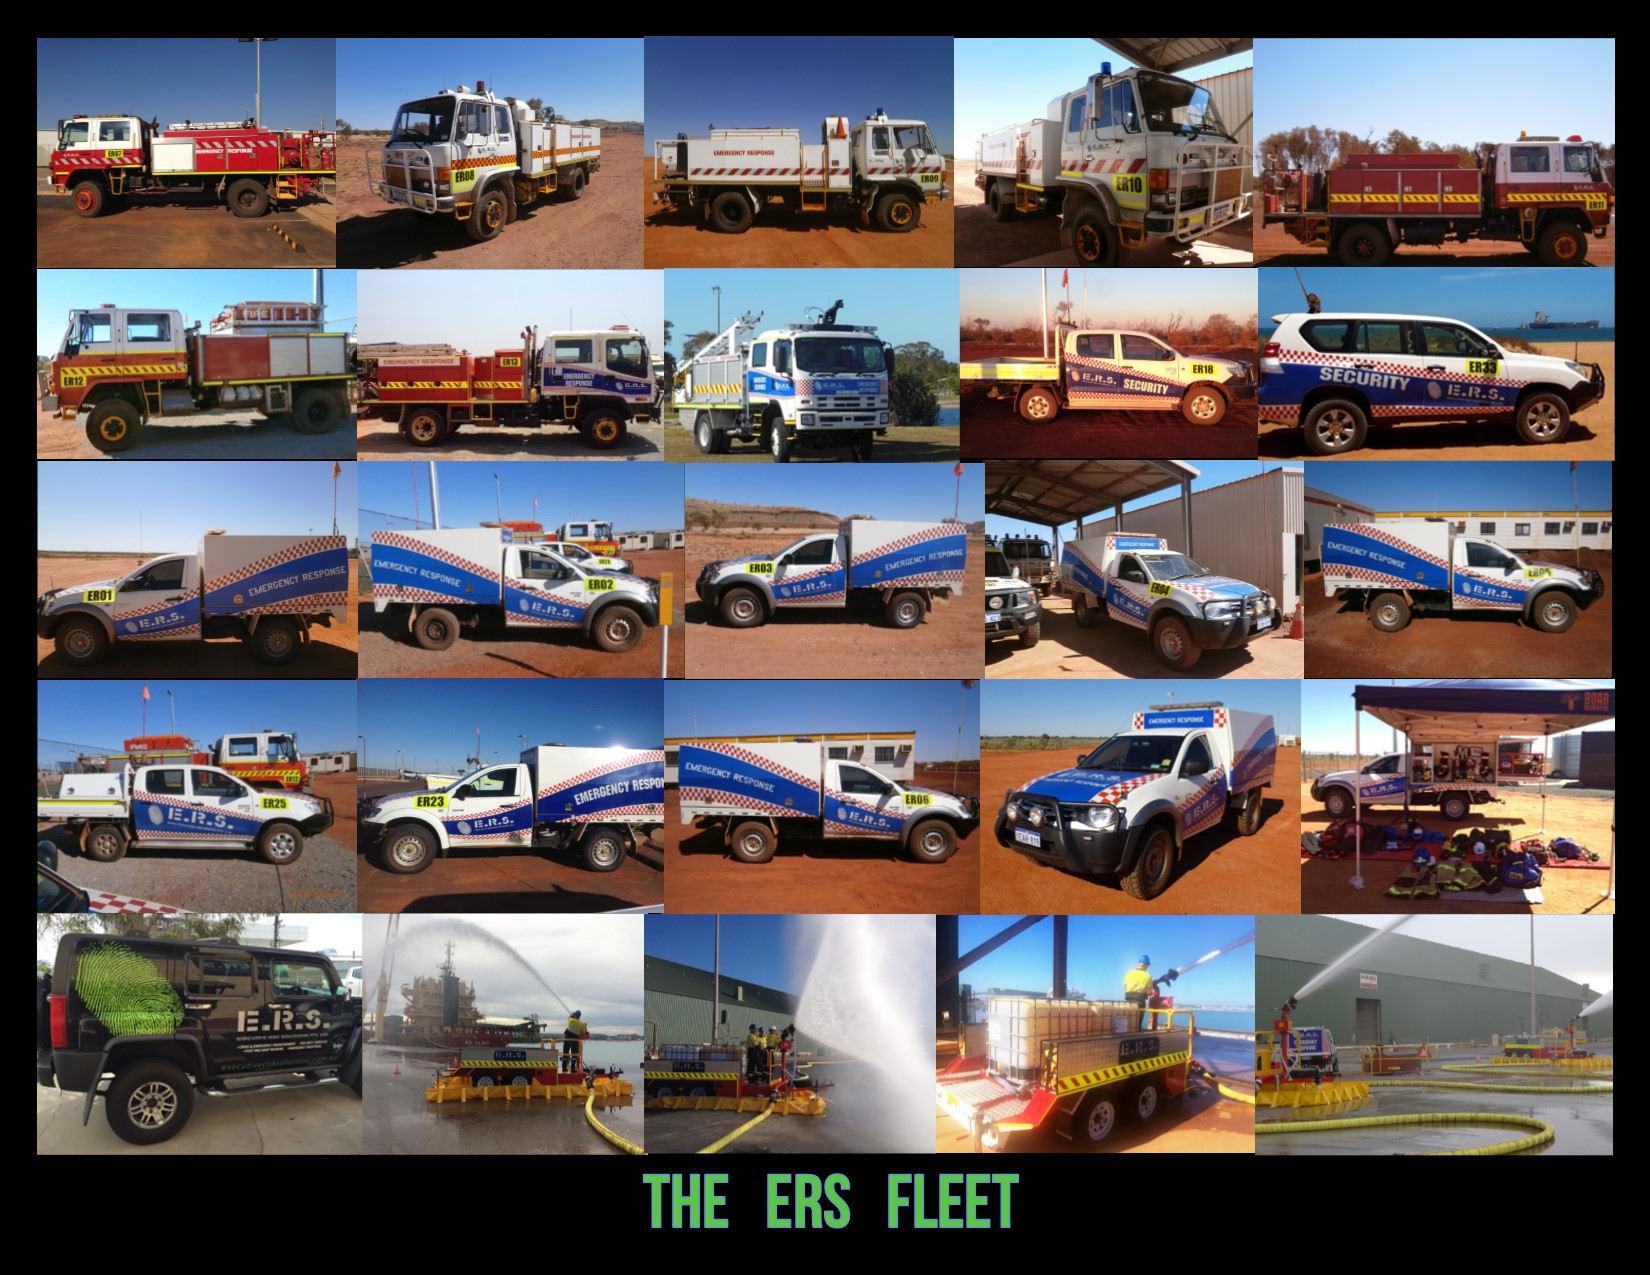 Executive Risk Solutions Fleet